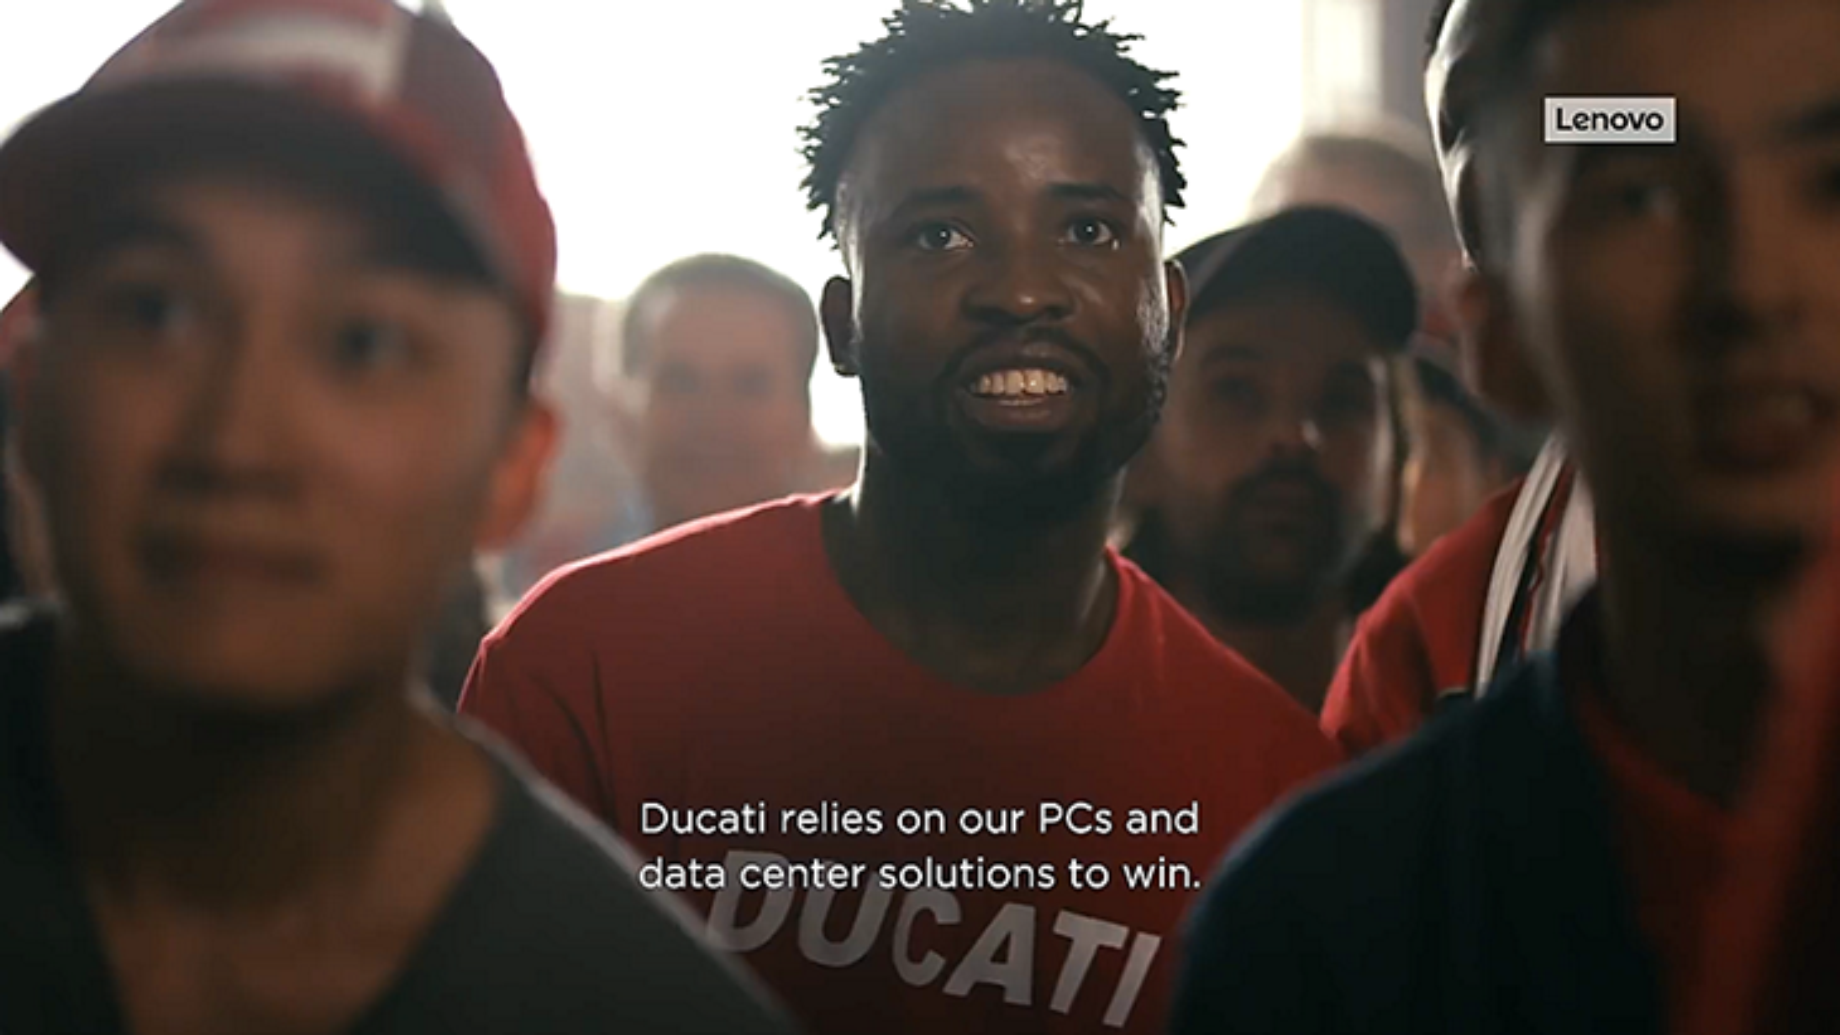 Ducati Video